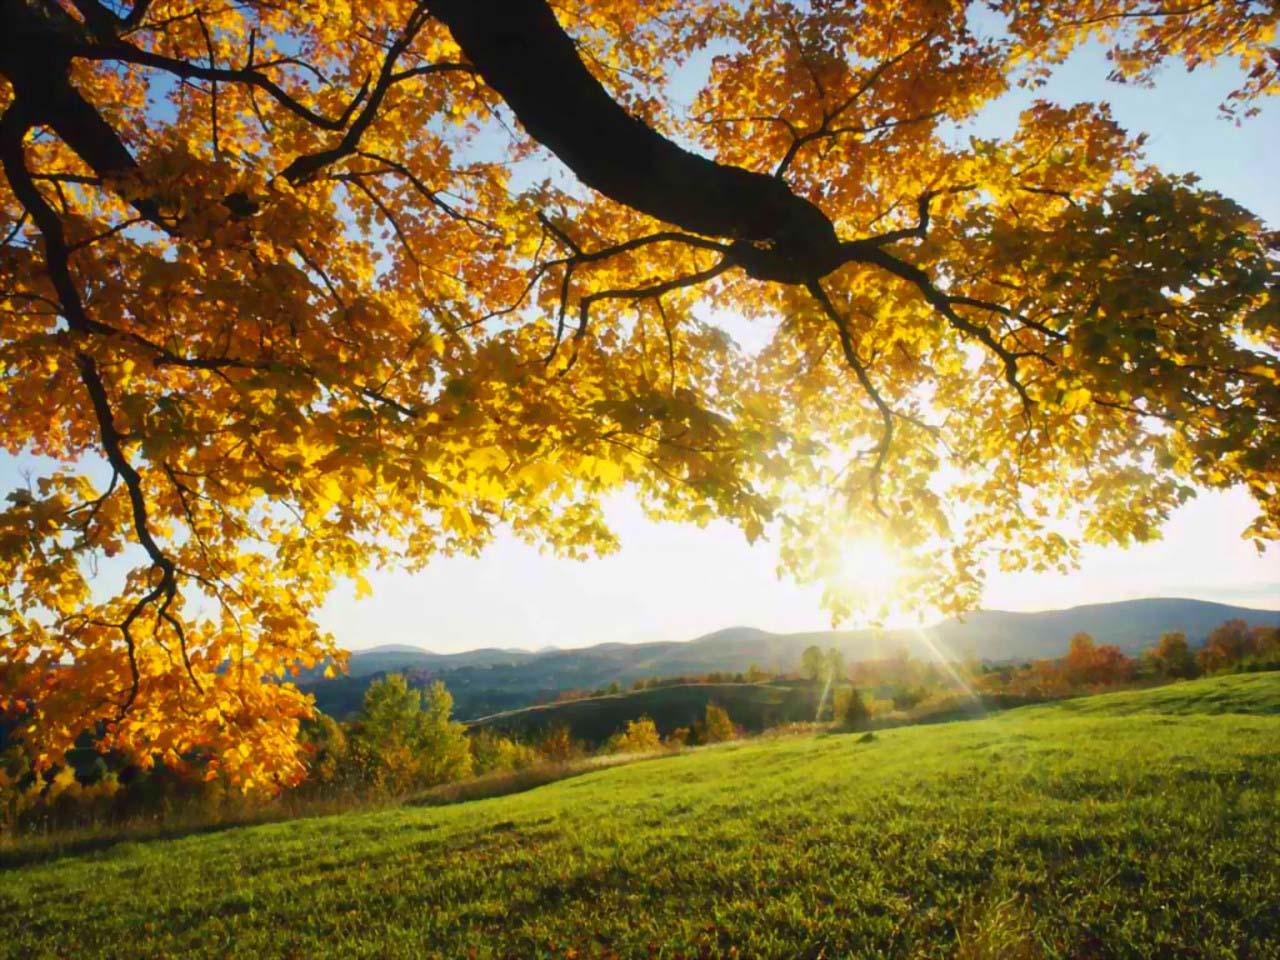 http://2.bp.blogspot.com/-E_-jNbkG3eg/TuS3FRHRTkI/AAAAAAAABm0/lgr7pBLeGQo/s1600/Natural+Pictures+%252811%2529.jpg